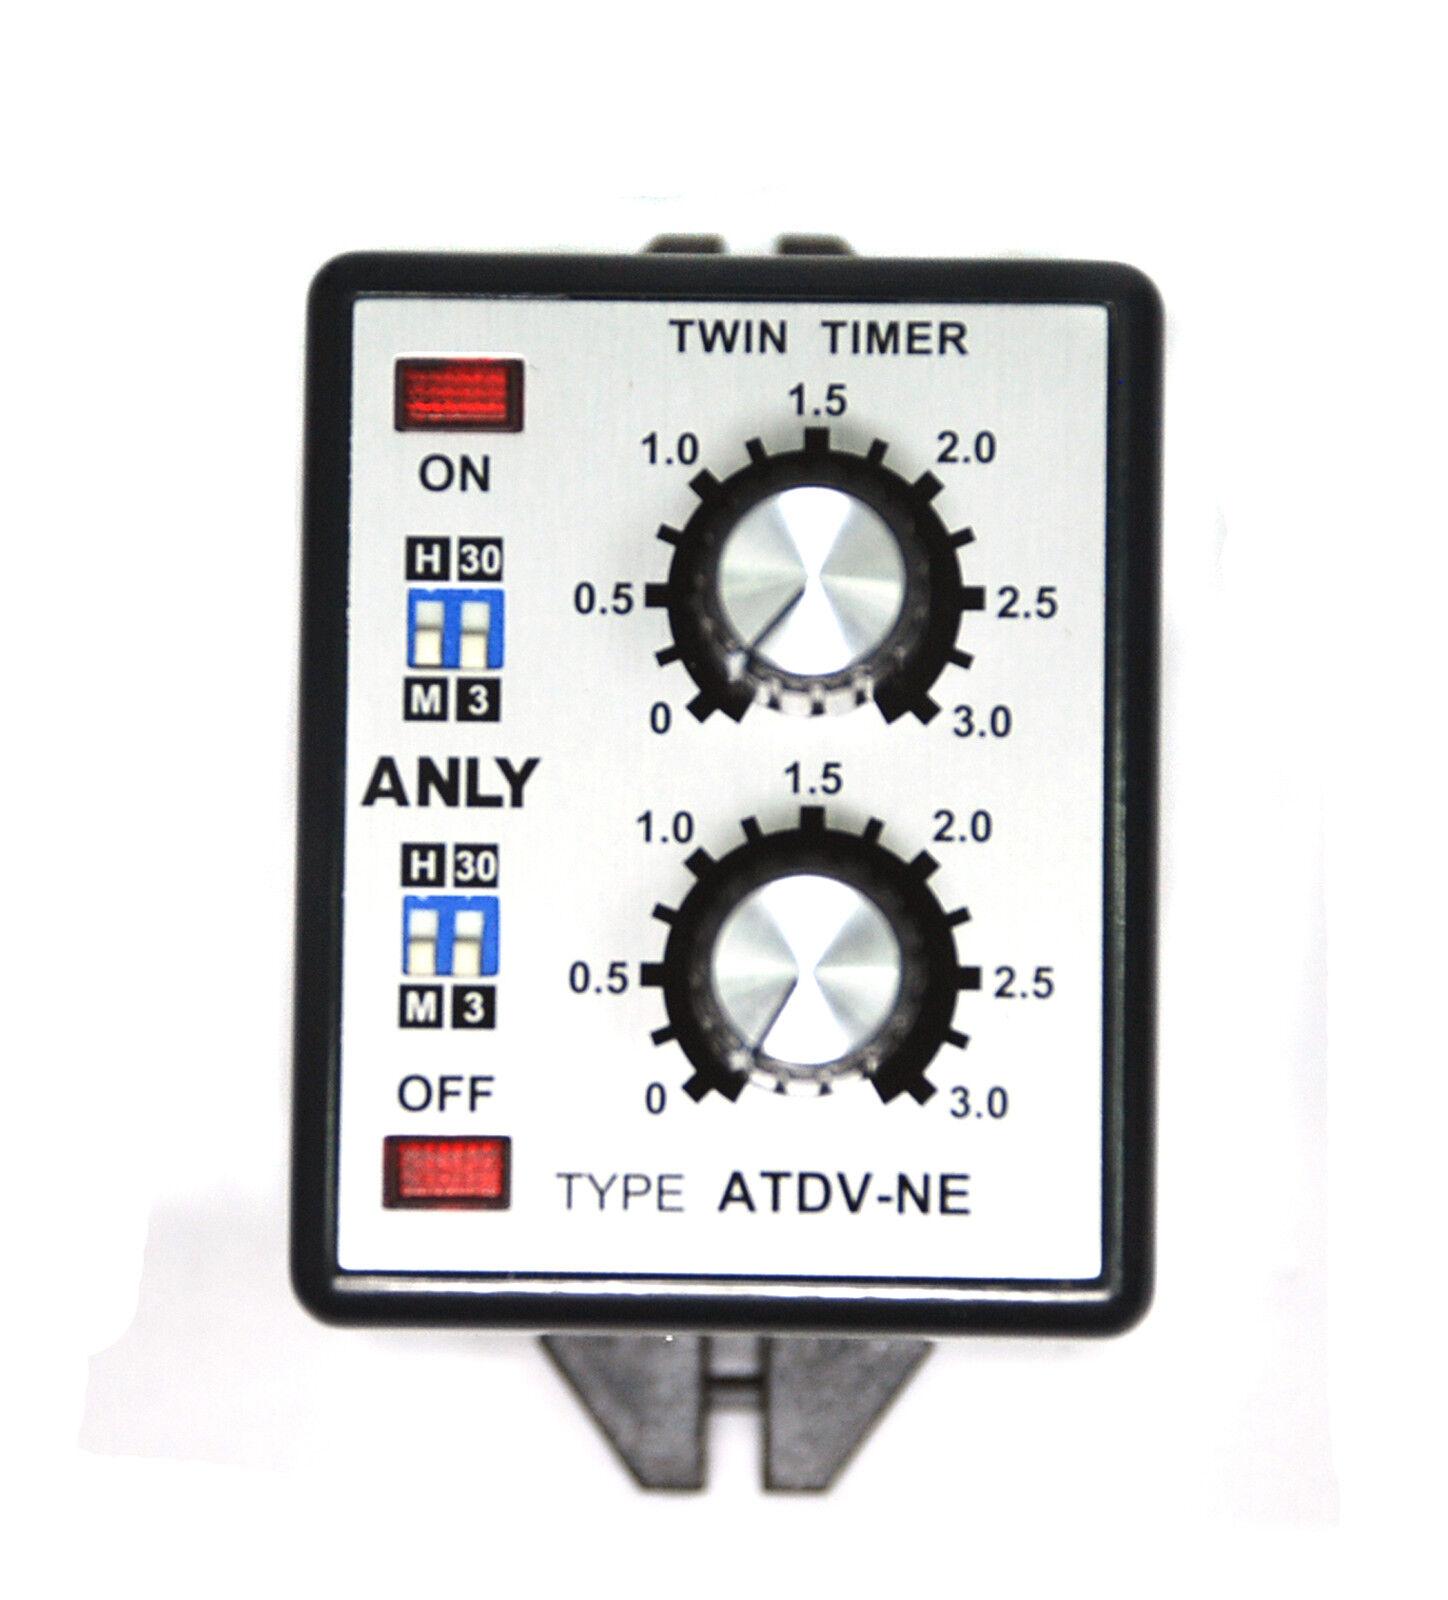 1pc Industrial Twin Timer ATDV-NB 3S 30S 3M 30M DC12V 12V ANLY Taiwan